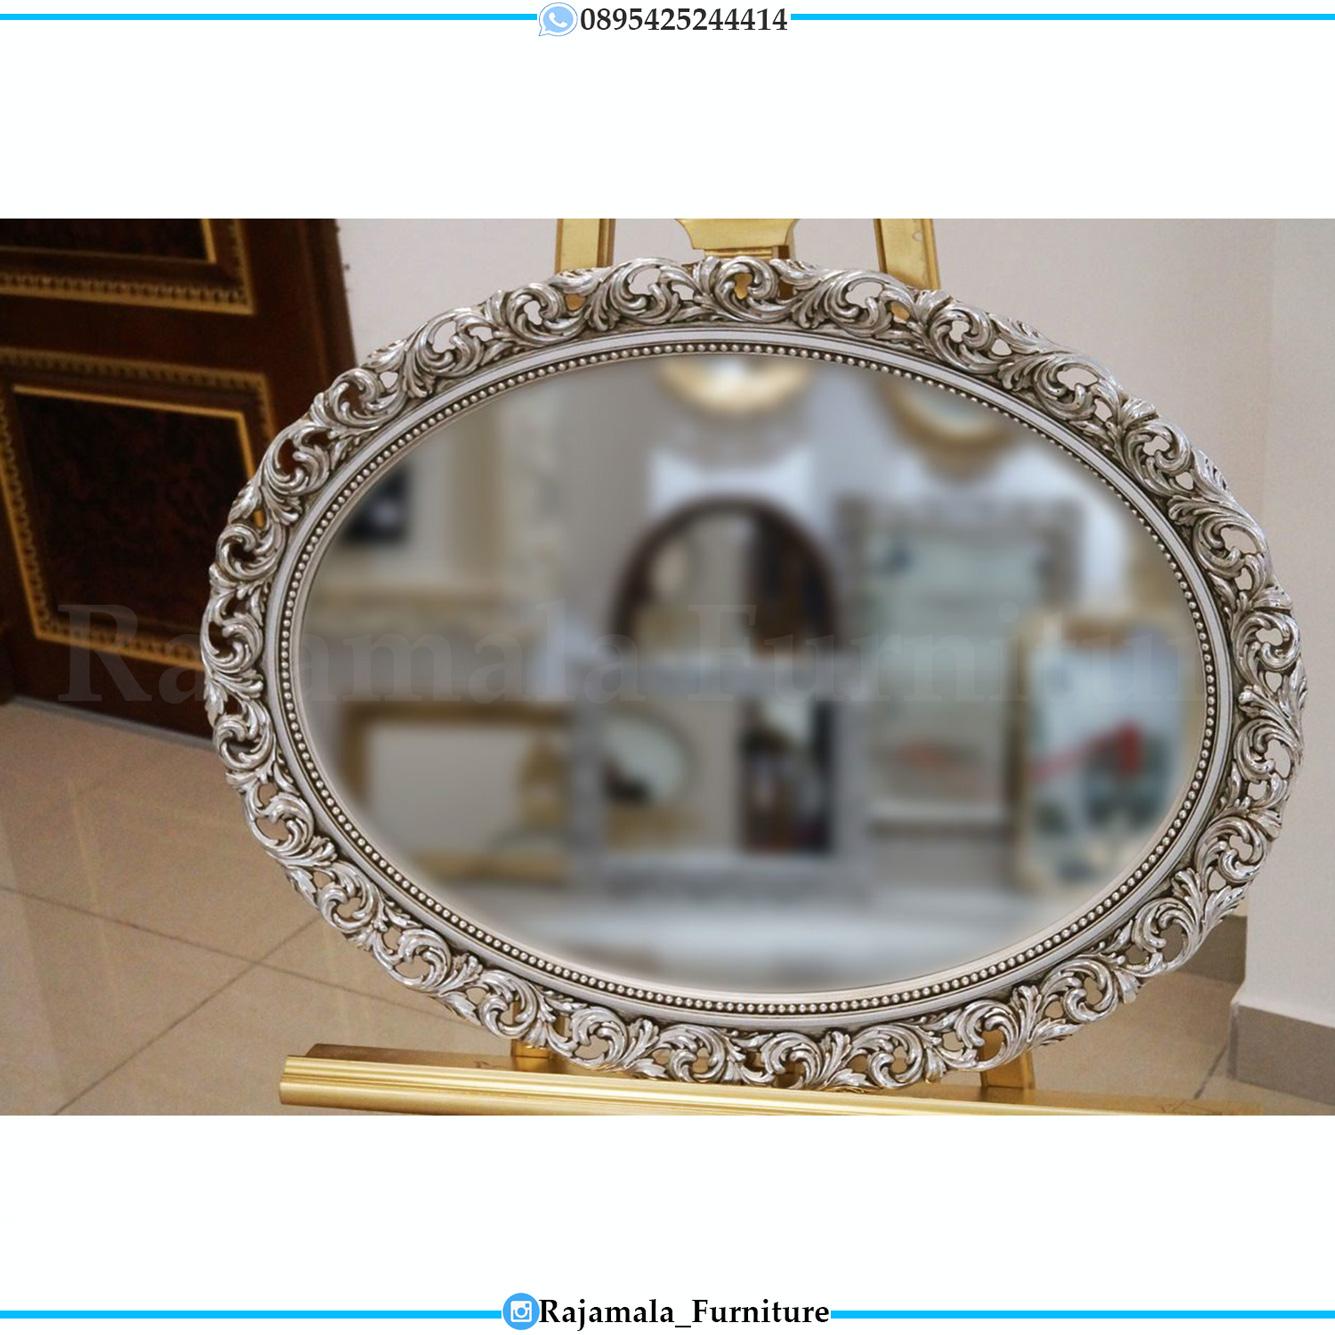 Desain Cermin Kaca Mewah Oval Luxury Carving Khas Jepara Terbaru RM-0502